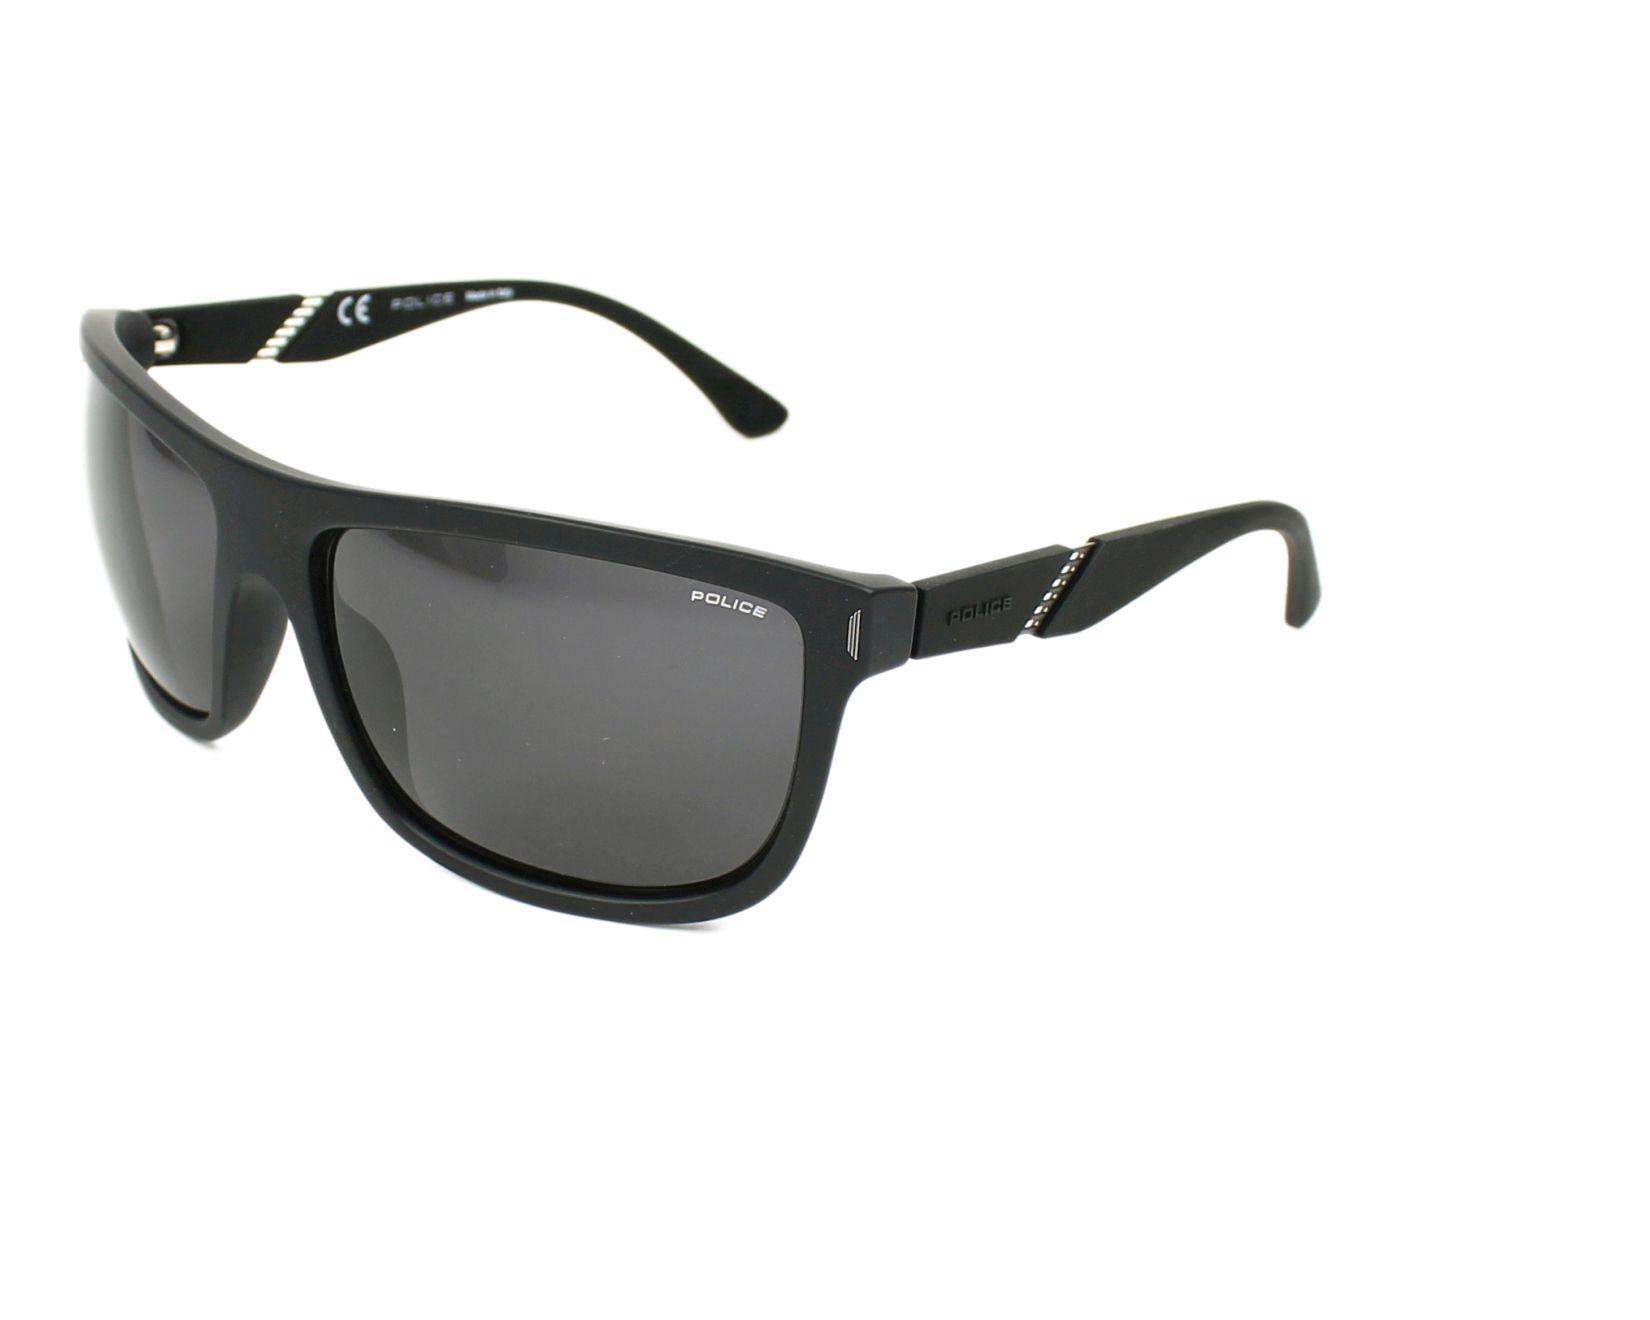 lunettes de soleil speed 2 de police en spl 351 06aa. Black Bedroom Furniture Sets. Home Design Ideas